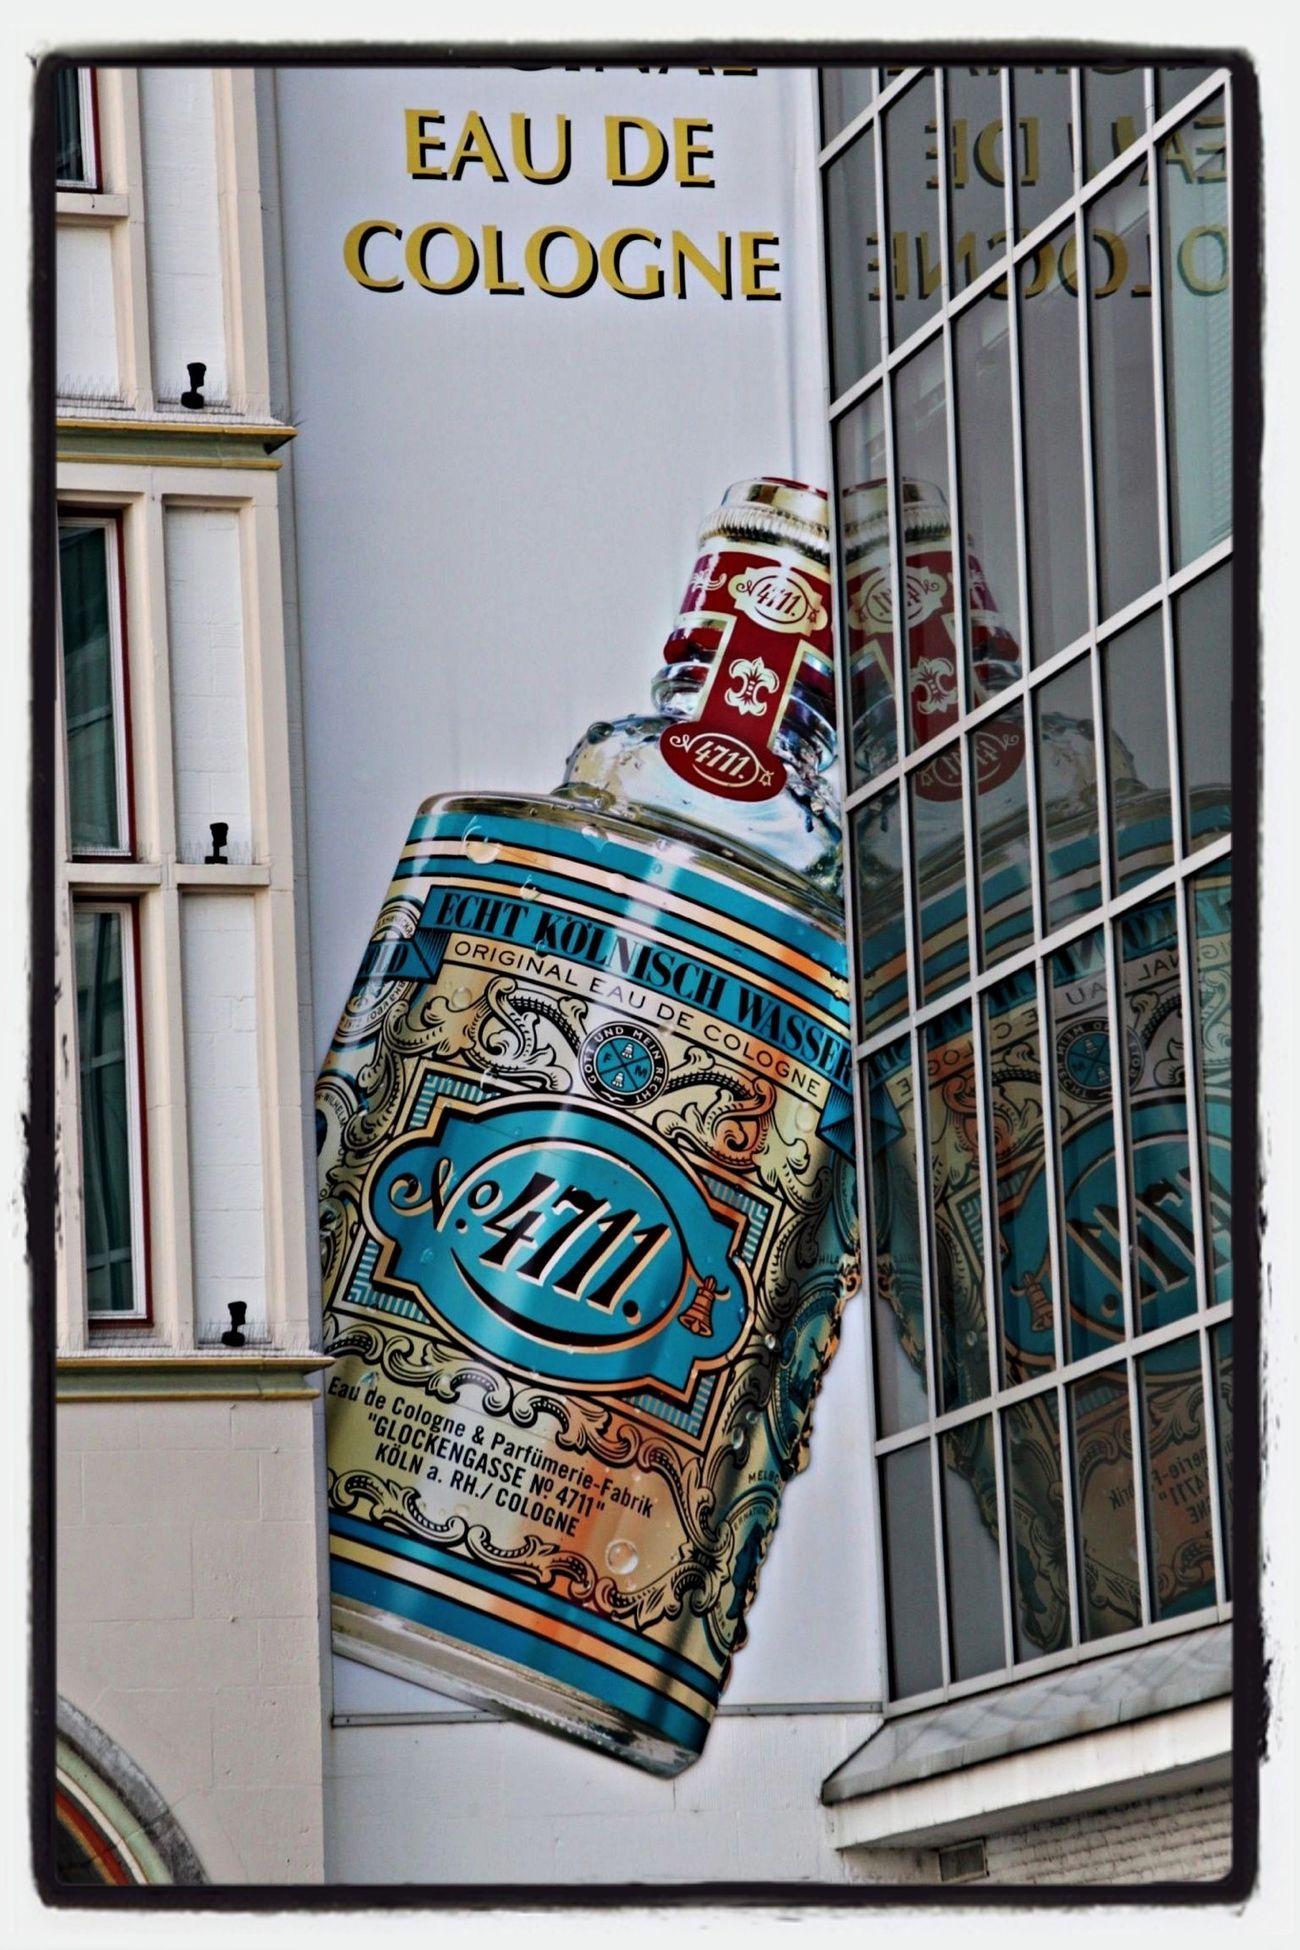 4711 - Kölnisch Wasser Cologne Graffiti Traveling